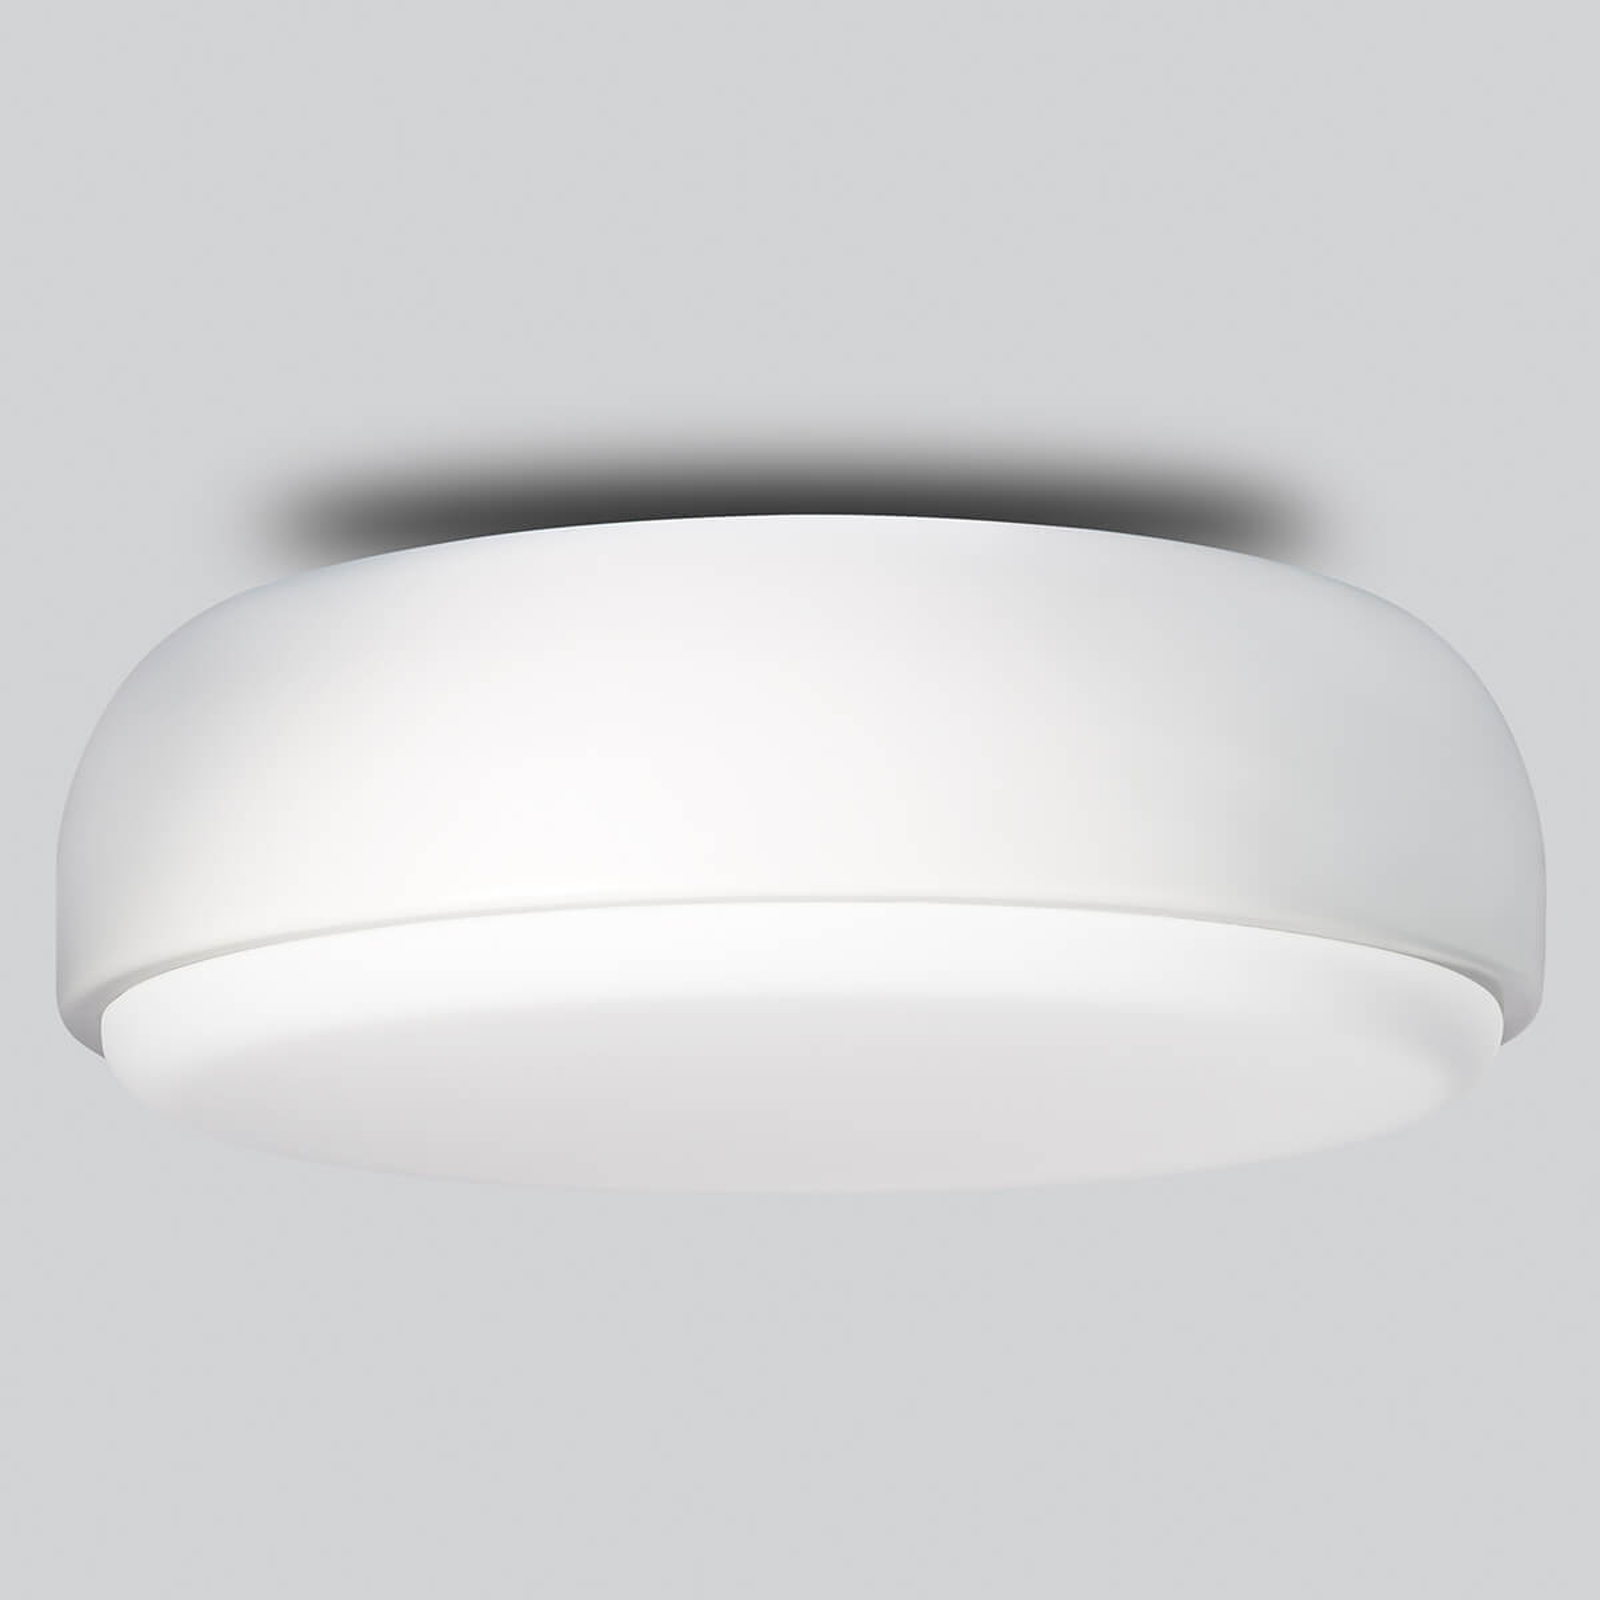 Witte design plafondlamp Over Me, 40 cm